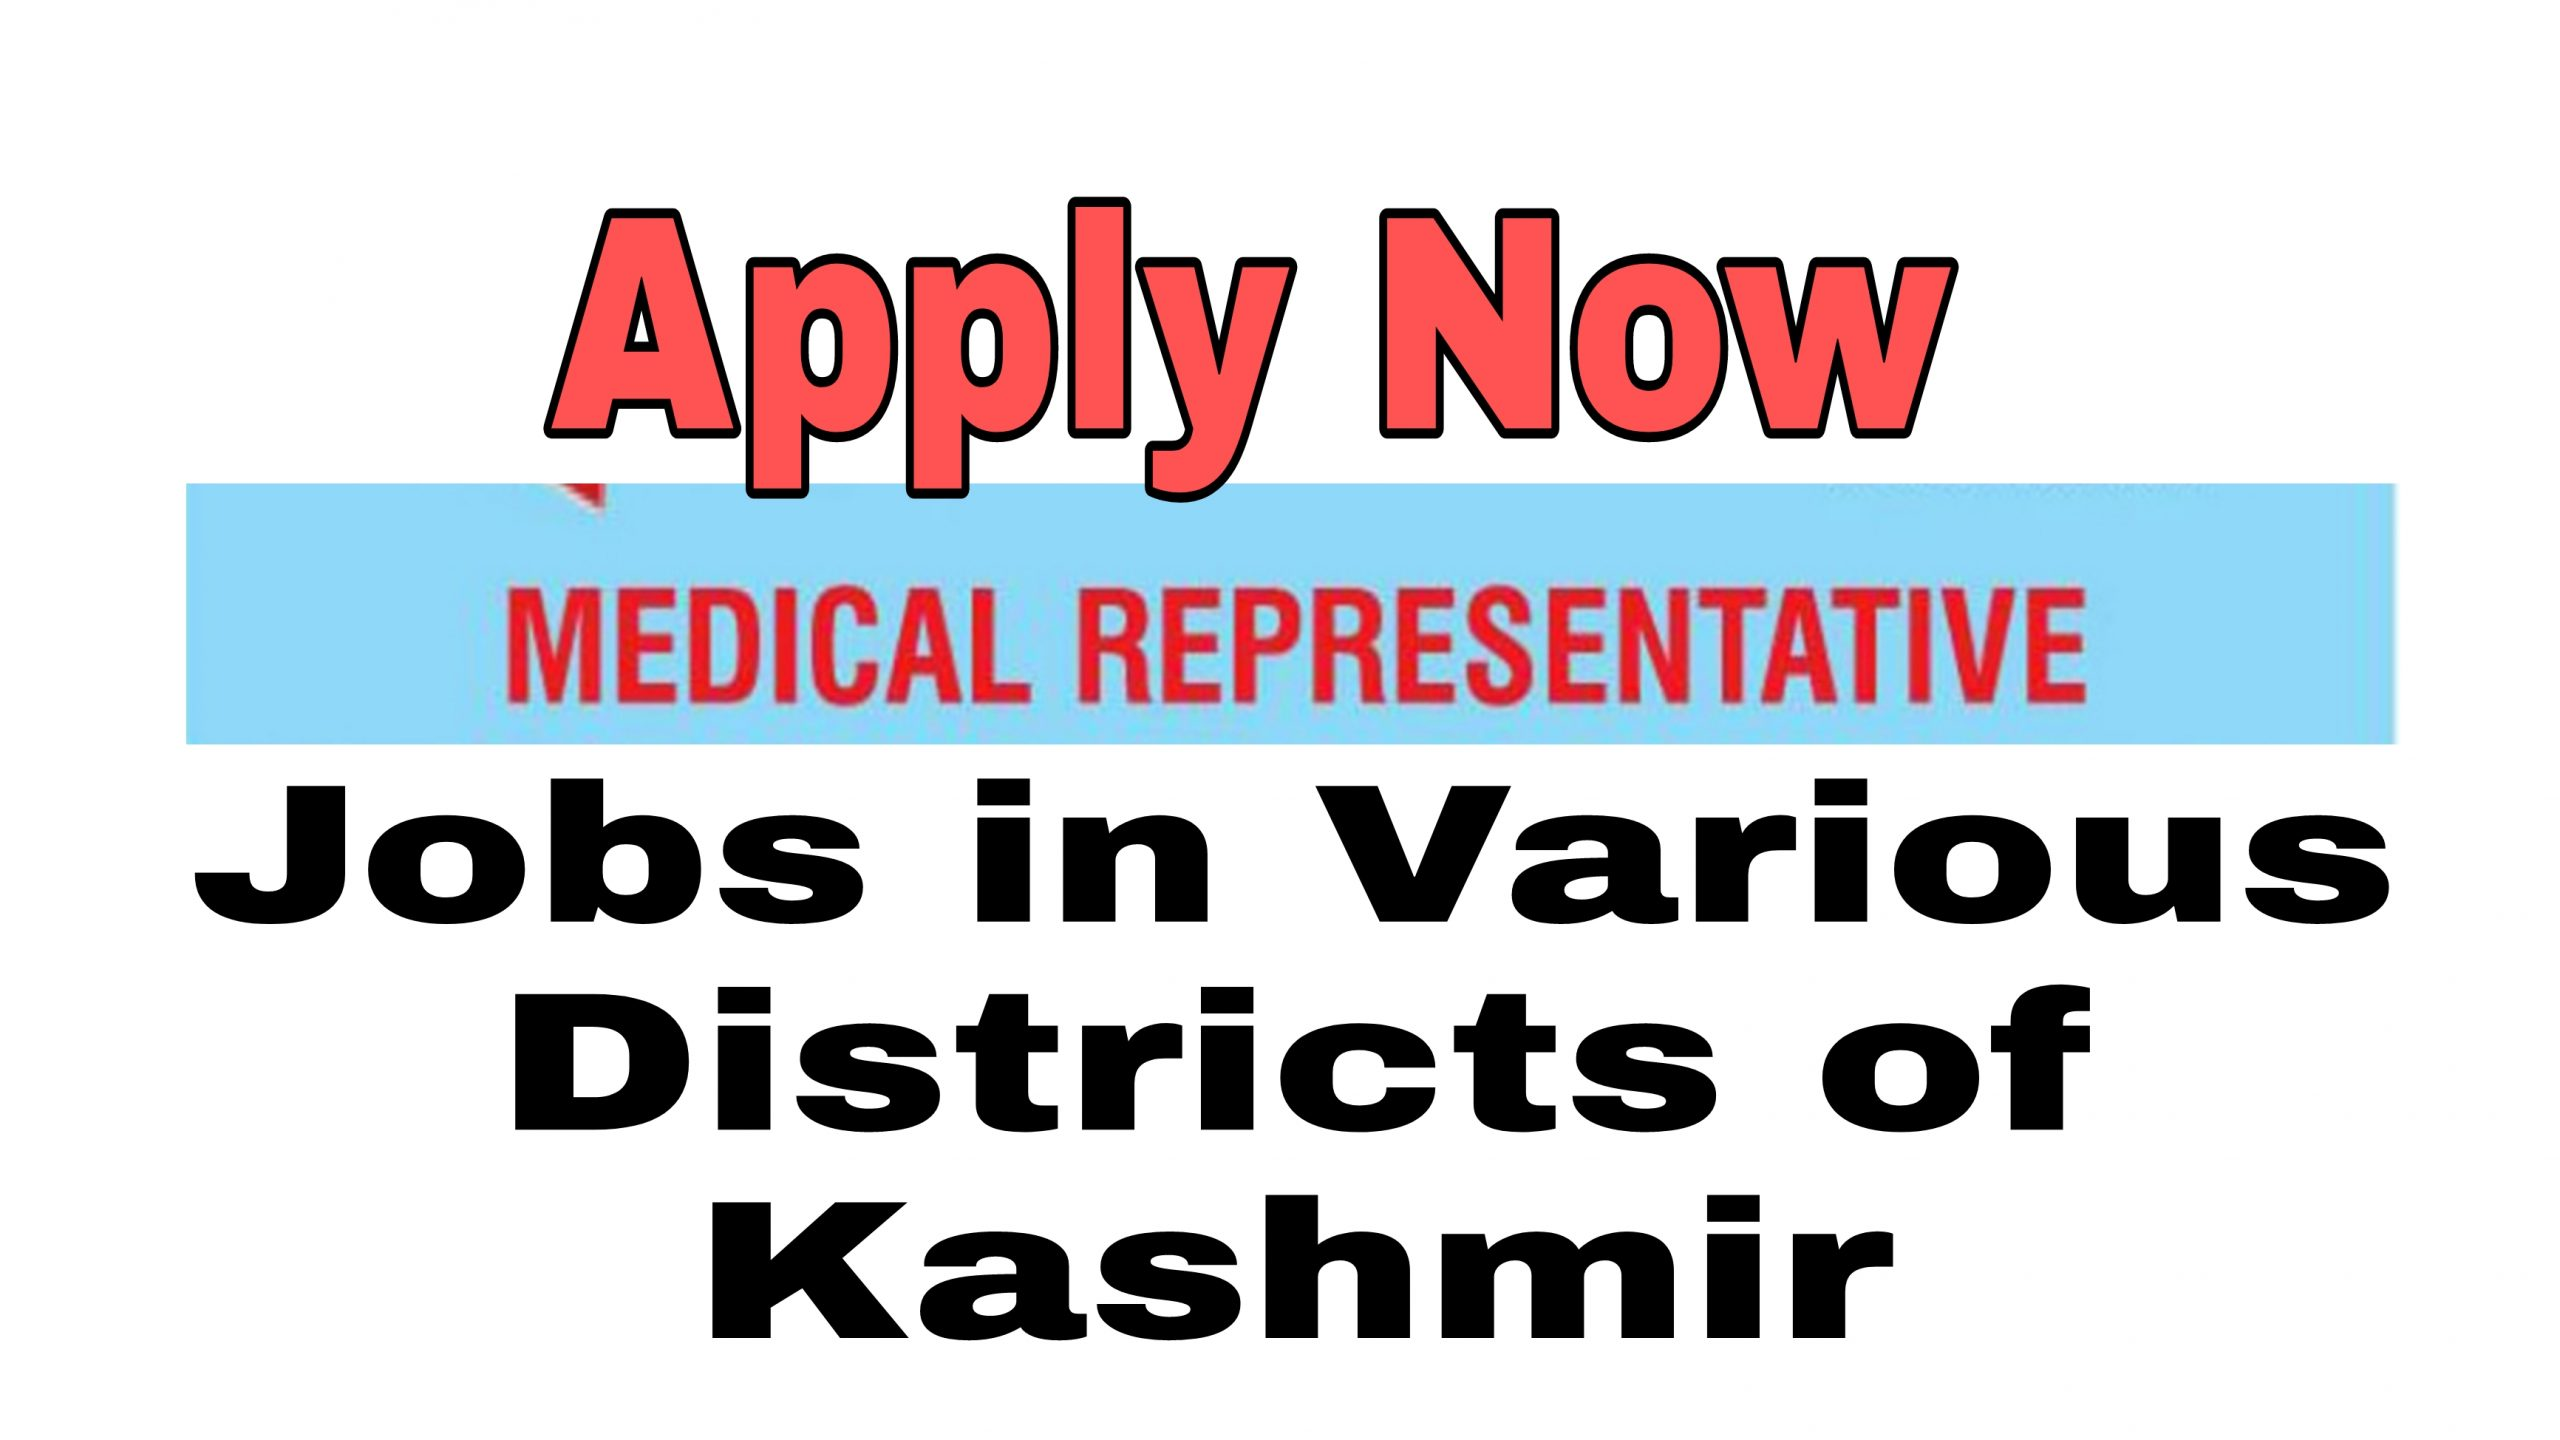 mr medical representative jobs Kashmir Districts Srinagar Sopore Anantnag Pulwama